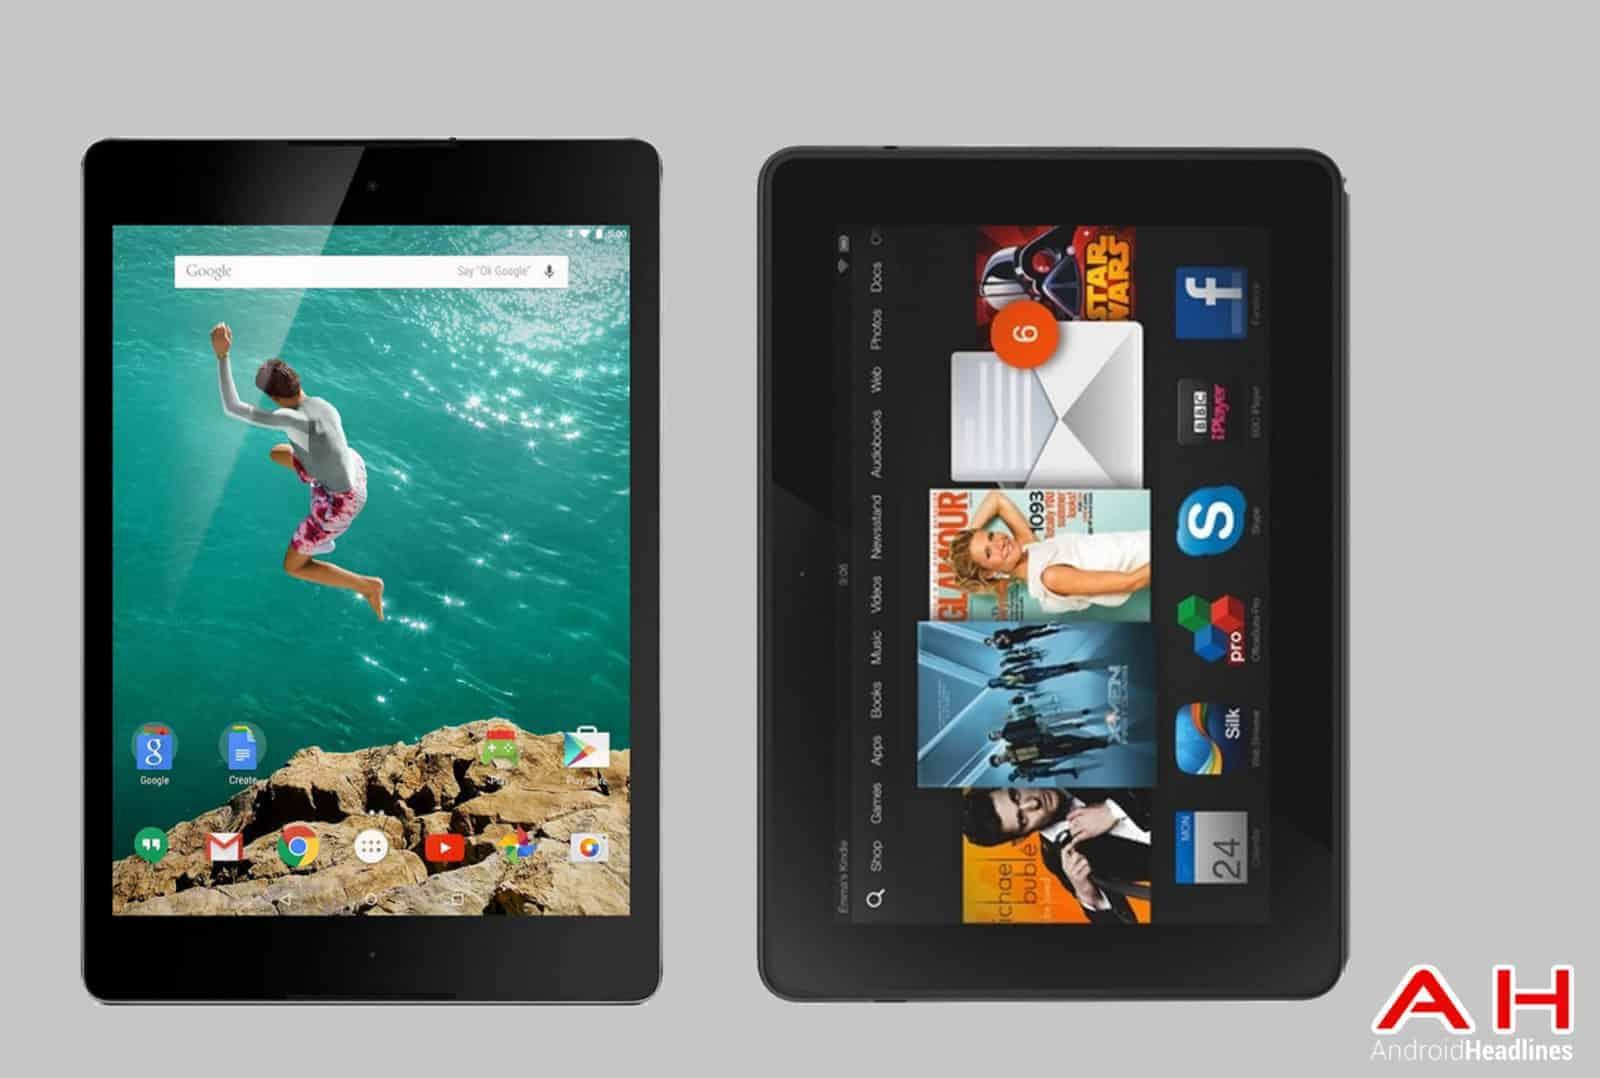 Nexus 9 vs Kindle Fire HDX 8.9 cam AH